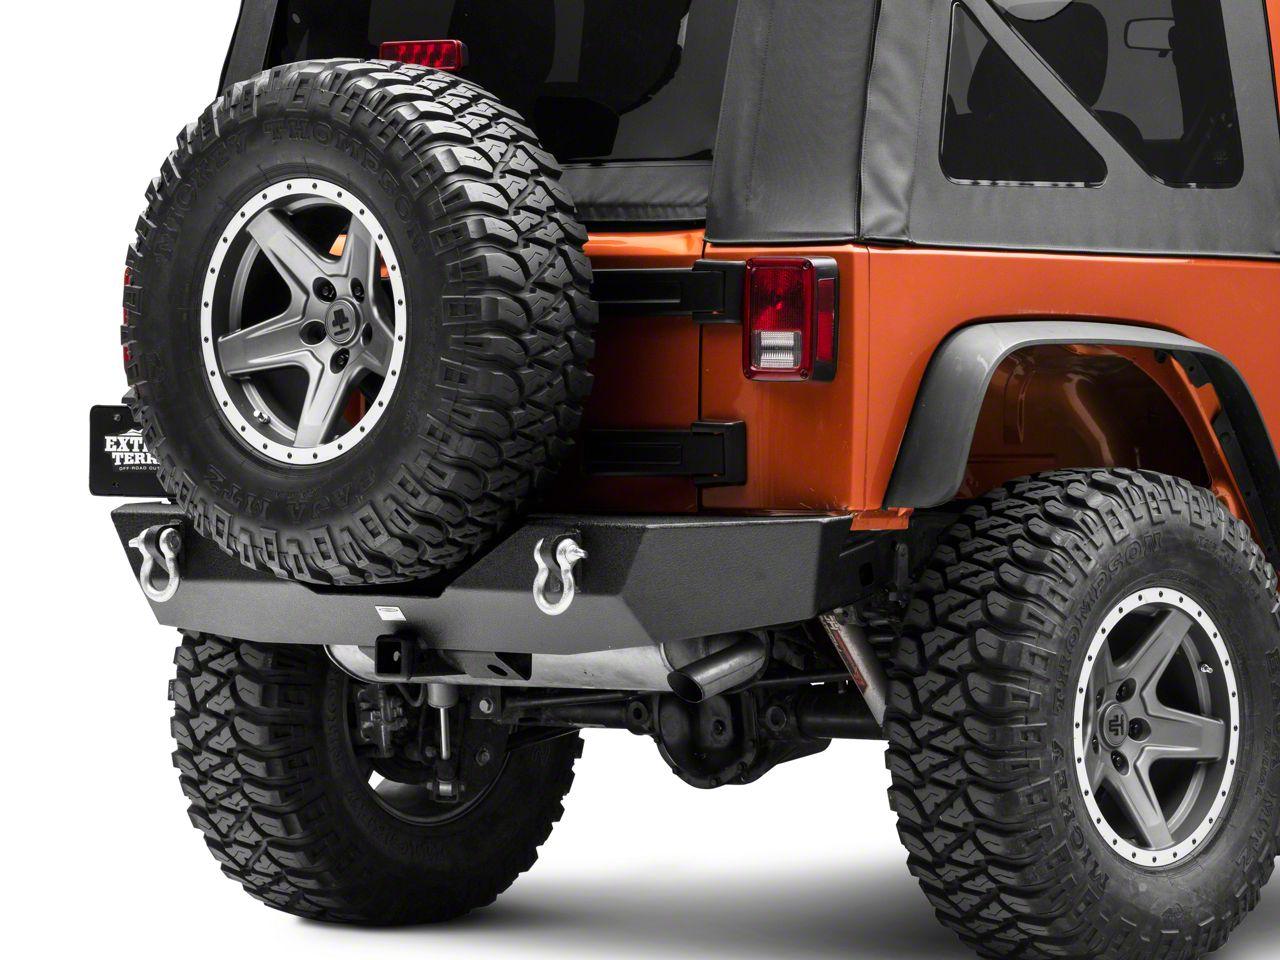 Smittybilt XRC Gen1 Rear Bumper w/o Tire Carrier (07-18 Jeep Wrangler JK)